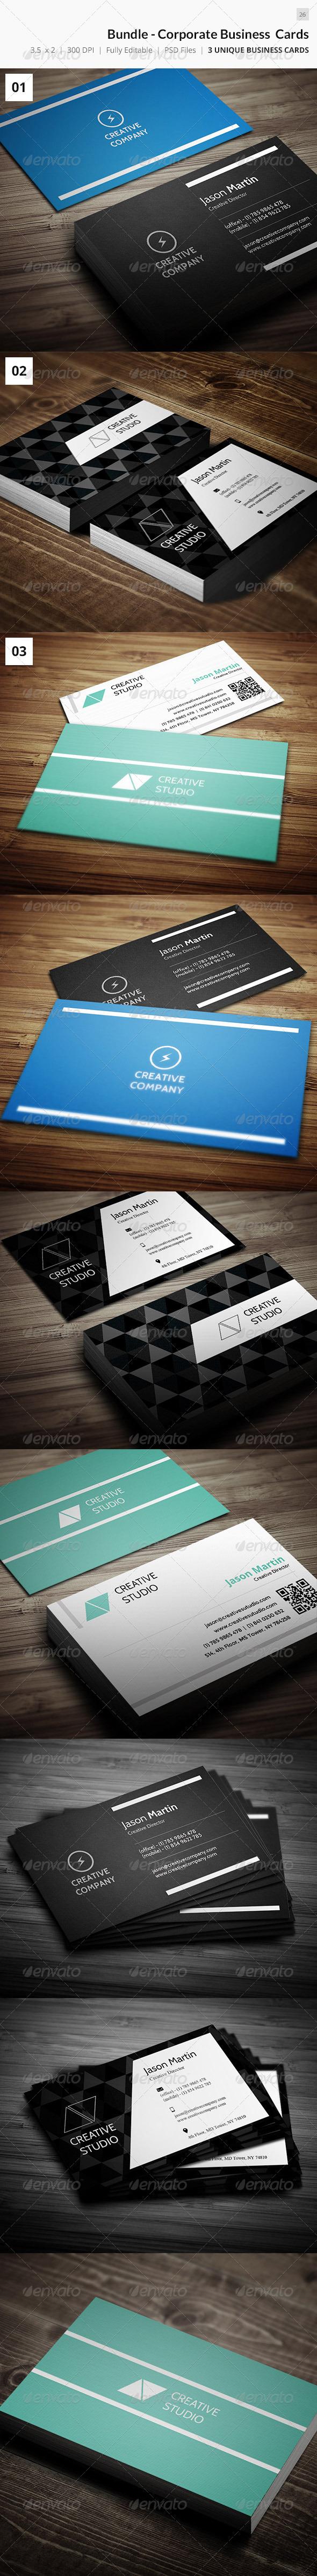 GraphicRiver Bundle Corporate Business Cards 26 7484491